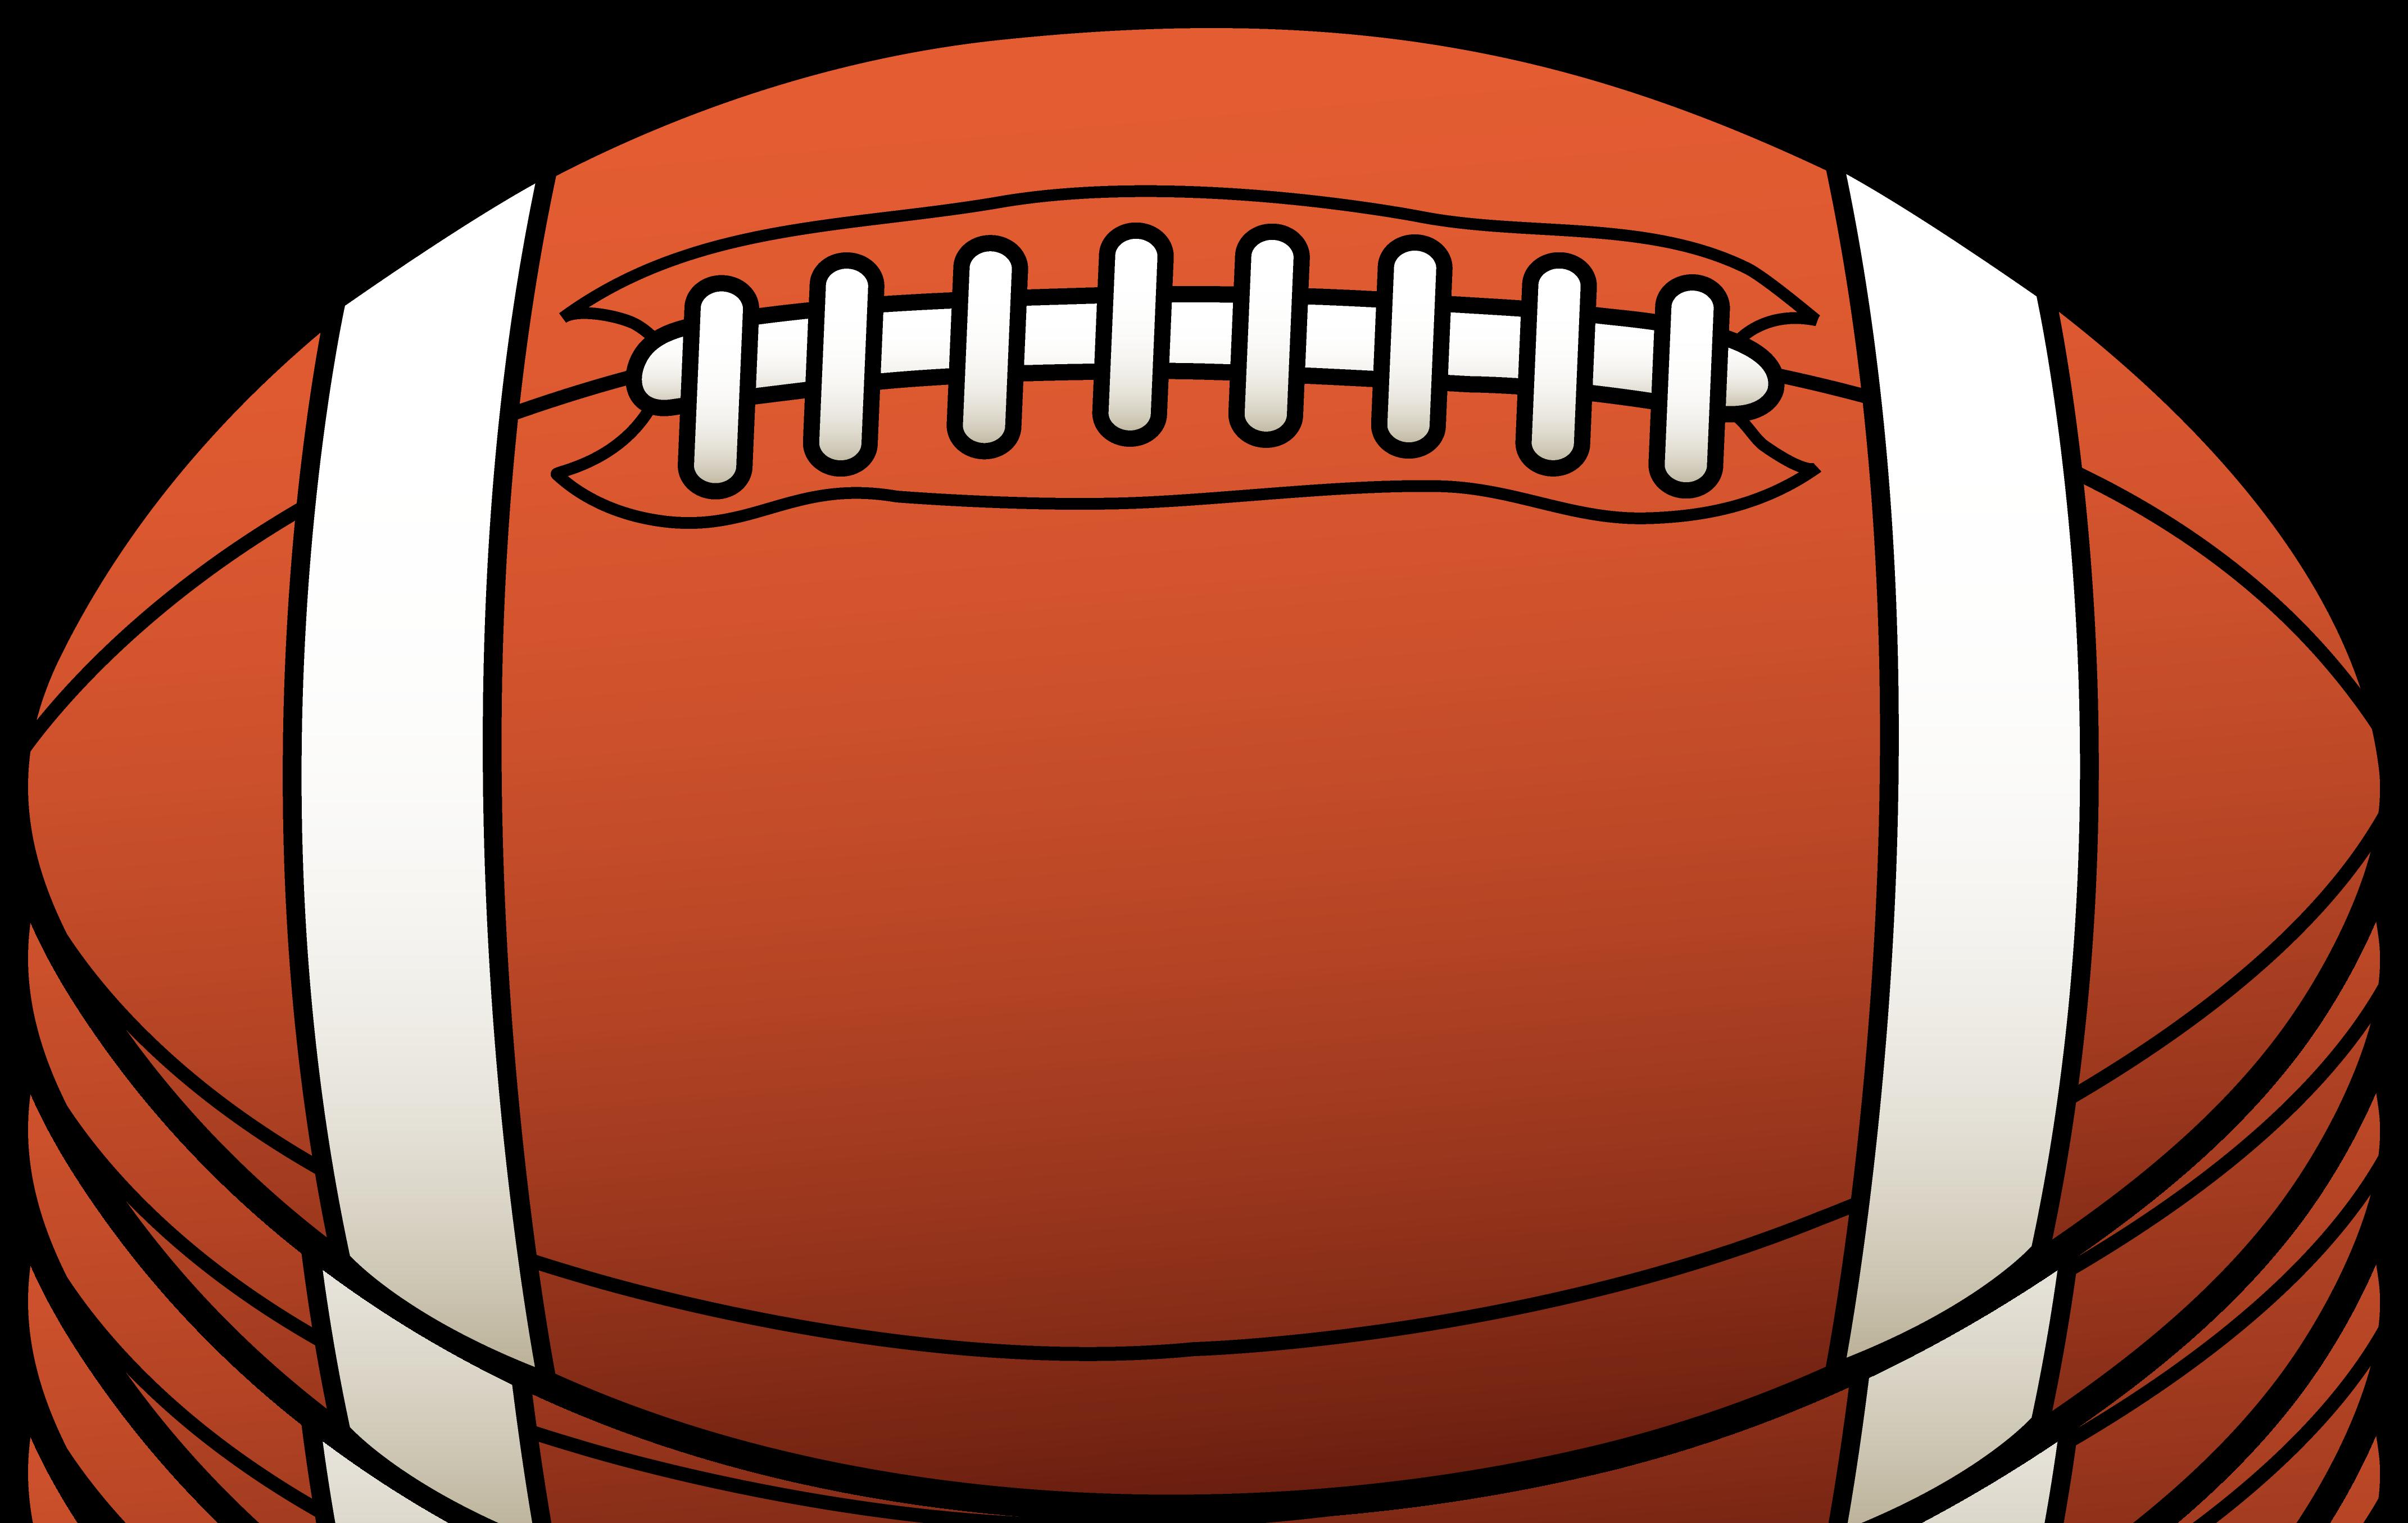 Clipart football free.